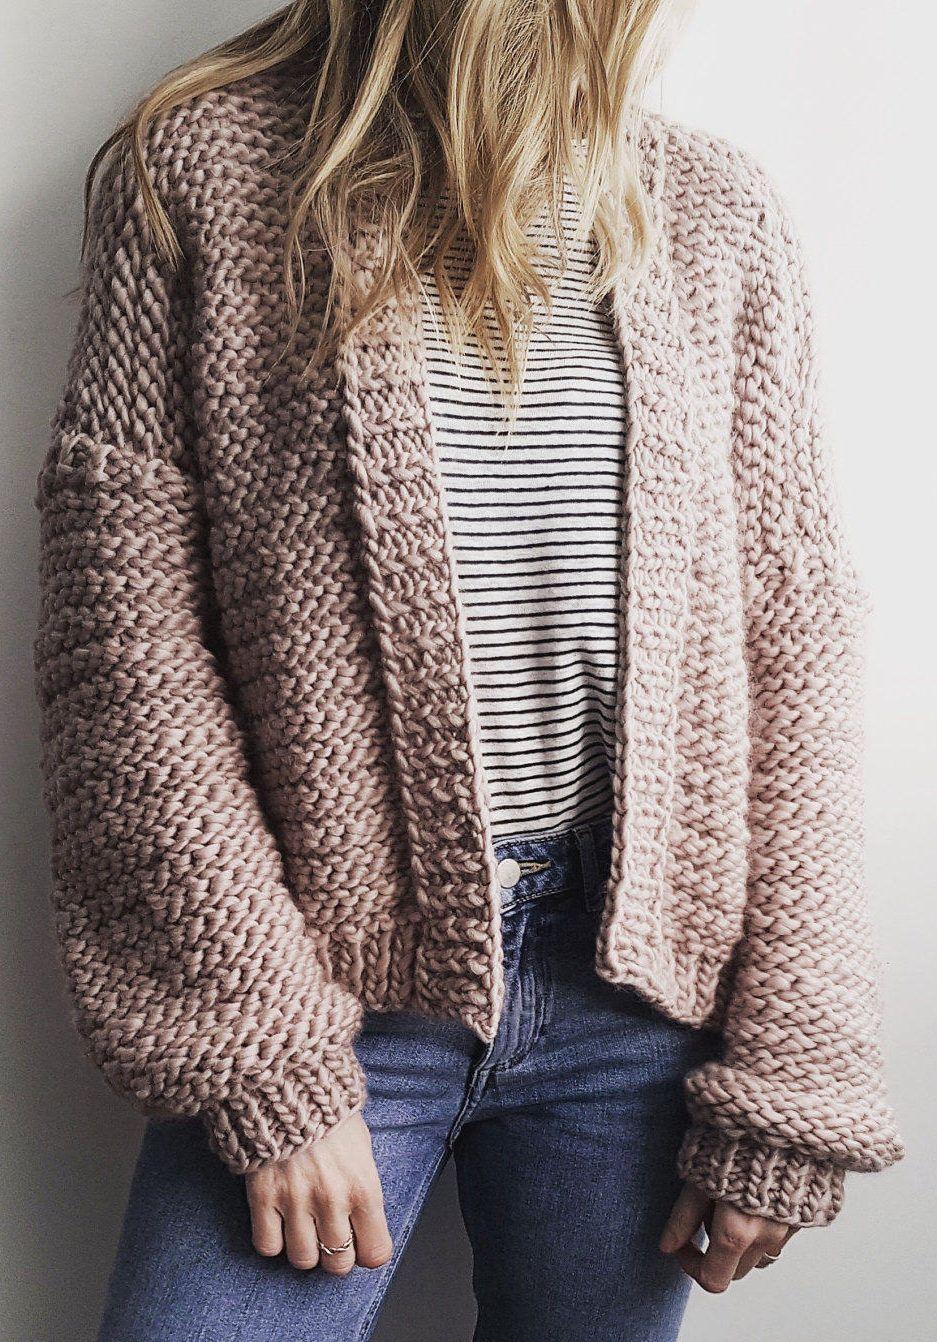 Xl Sweater Knitting Pattern : Knitting pattern for bomber cardi style cardigan